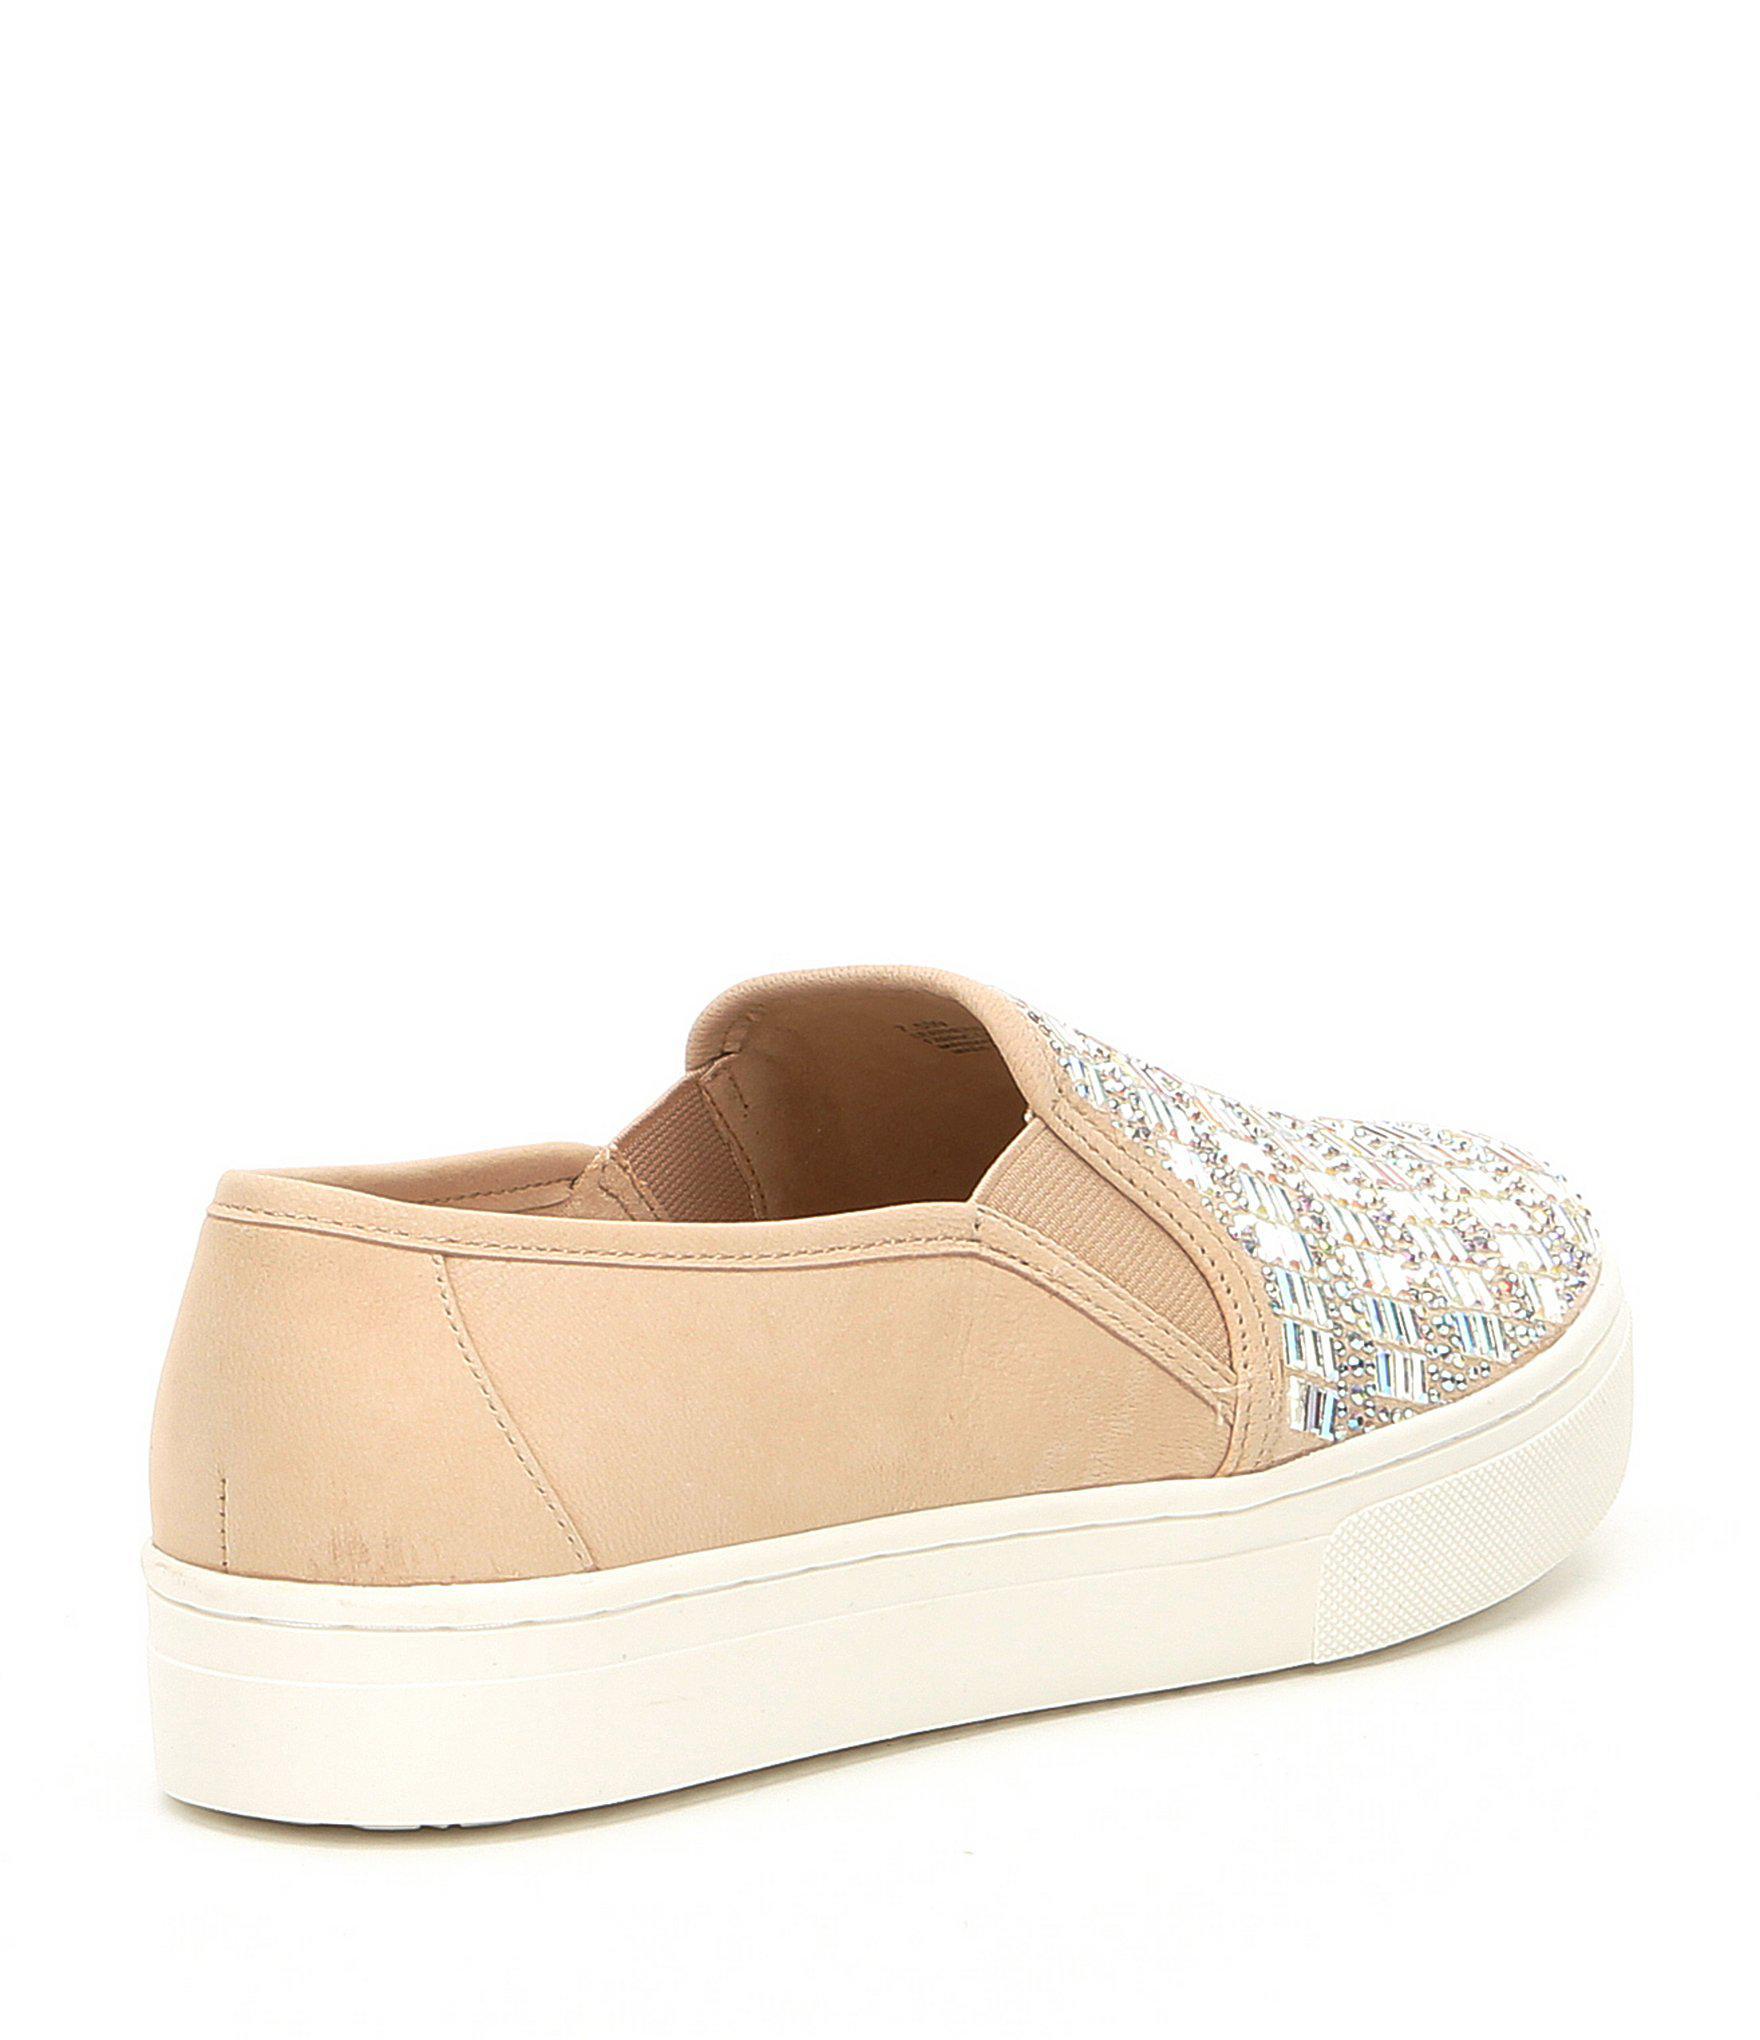 a78b1c6fb4d Women's Luxine Rhinestone Sneakers